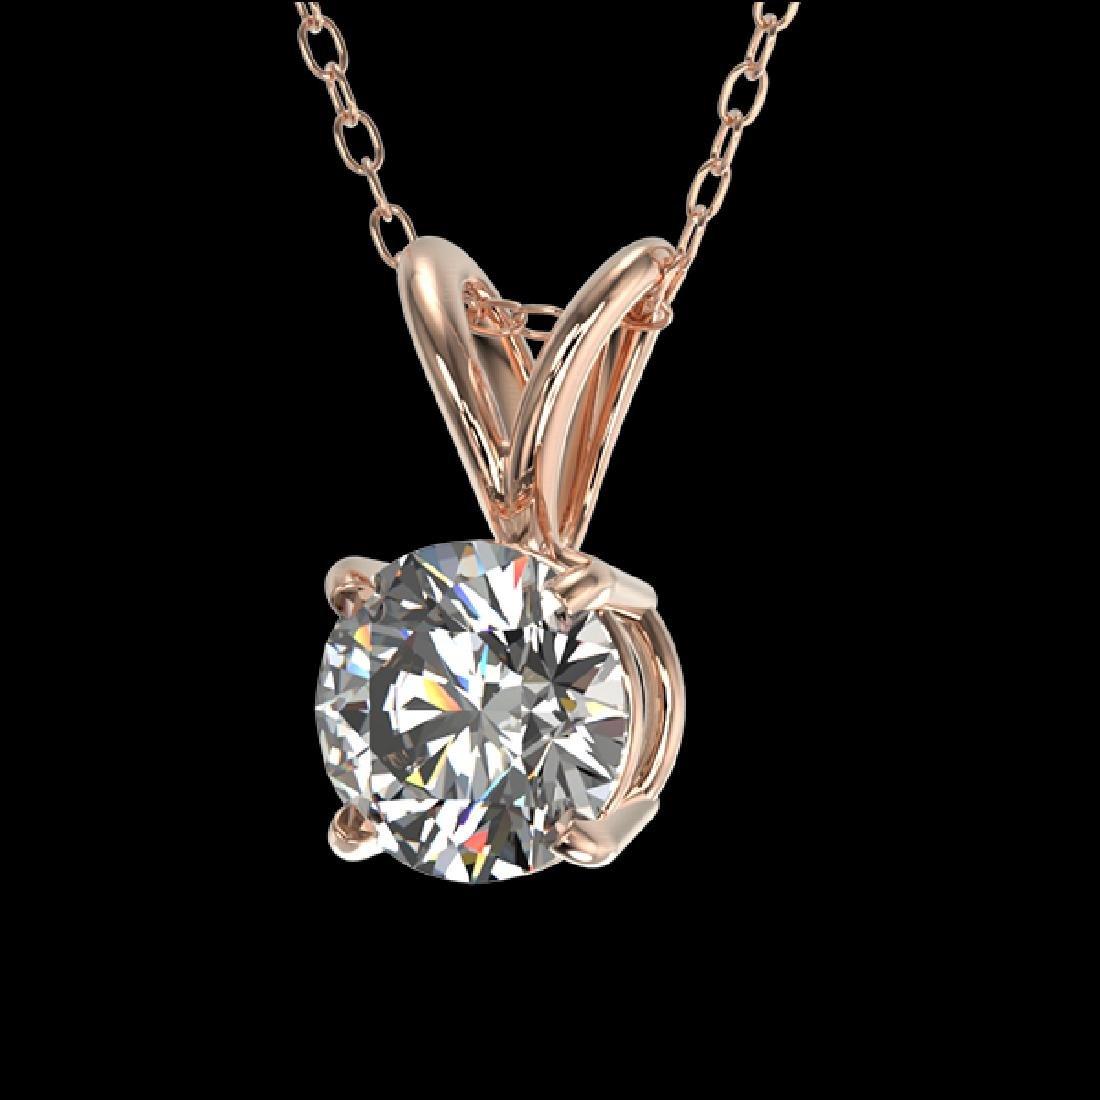 0.51 CTW Certified G-Si Quality Diamond Bridal - 2